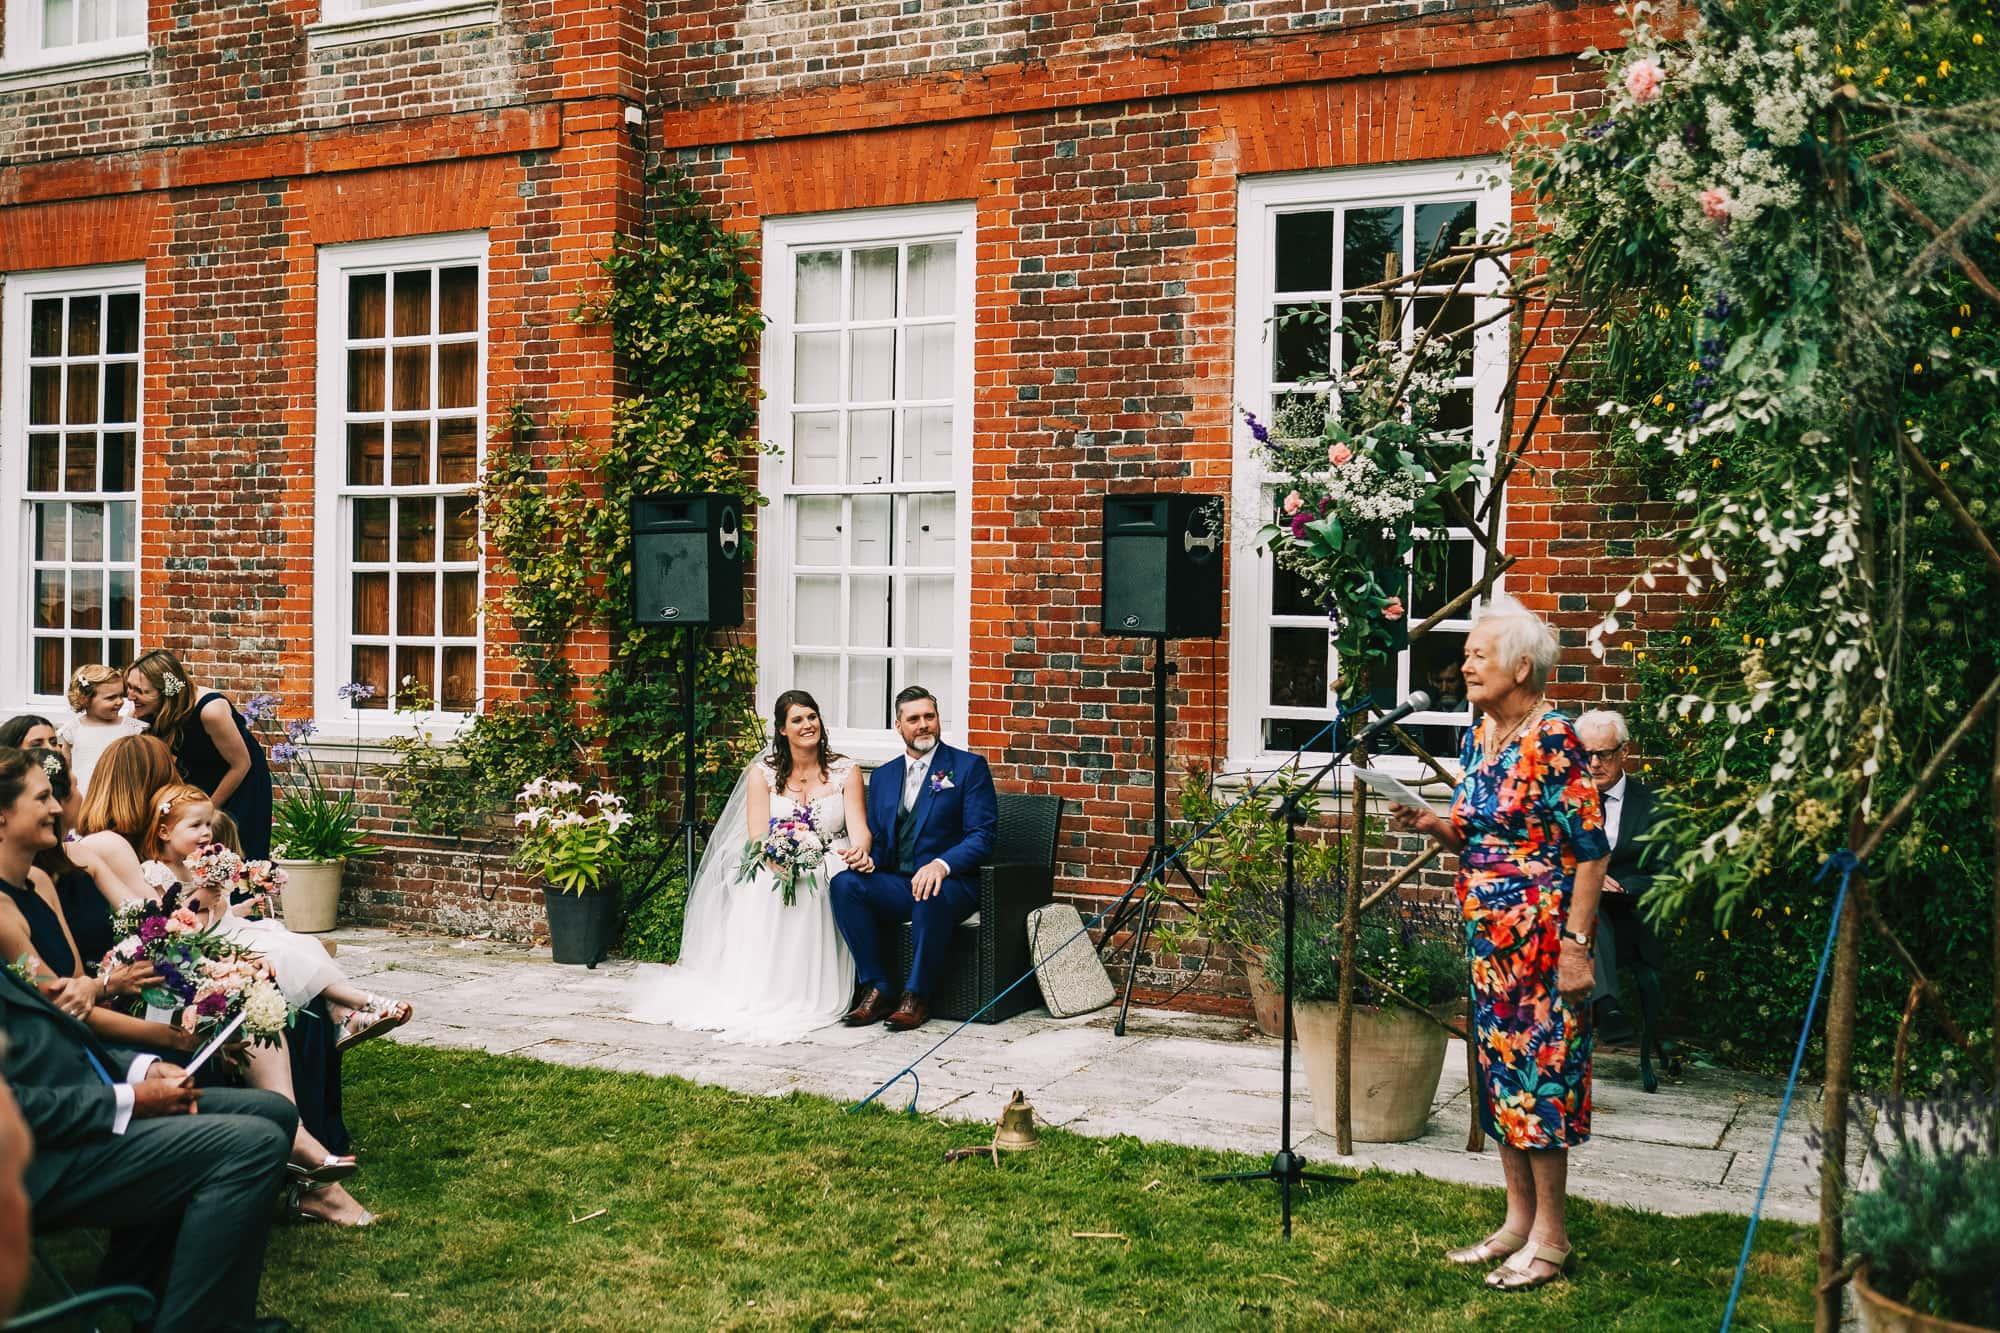 Canterbury Wedding Photographer - Groom getting ready